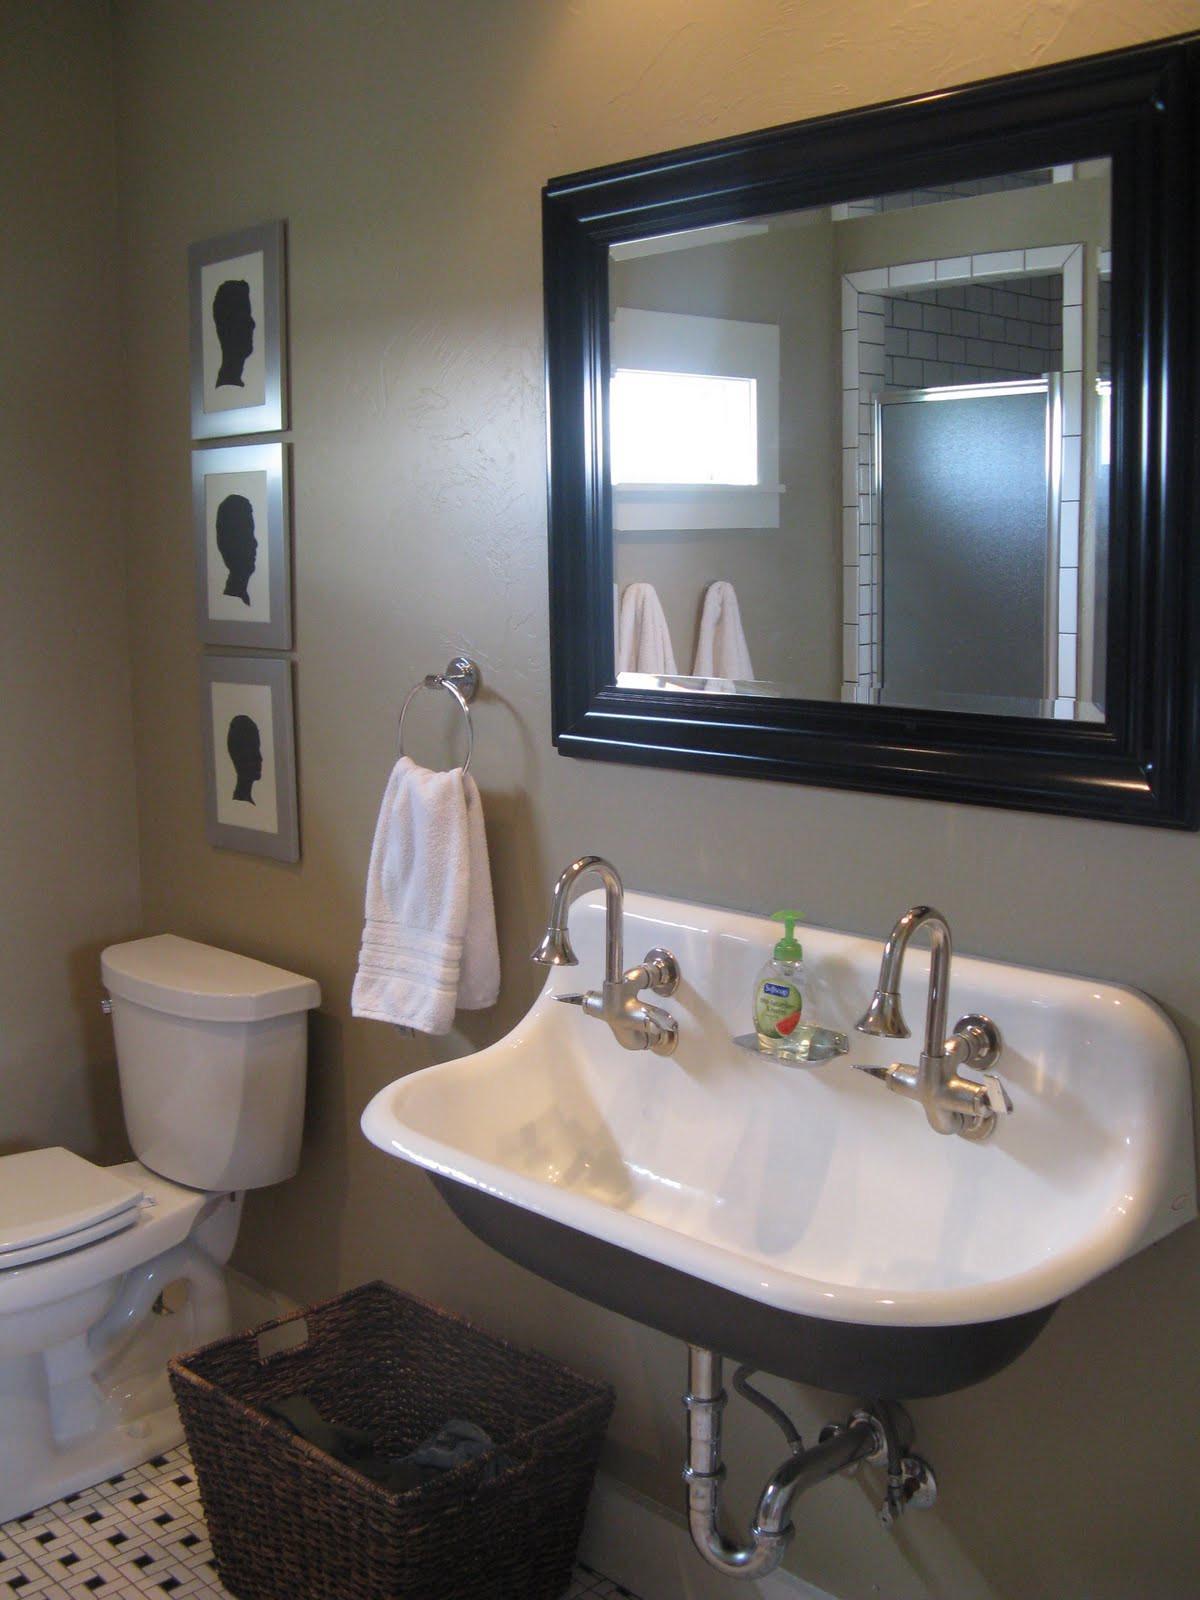 Best ideas about Farmhouse Bathroom Sink . Save or Pin Boy s bath Now.